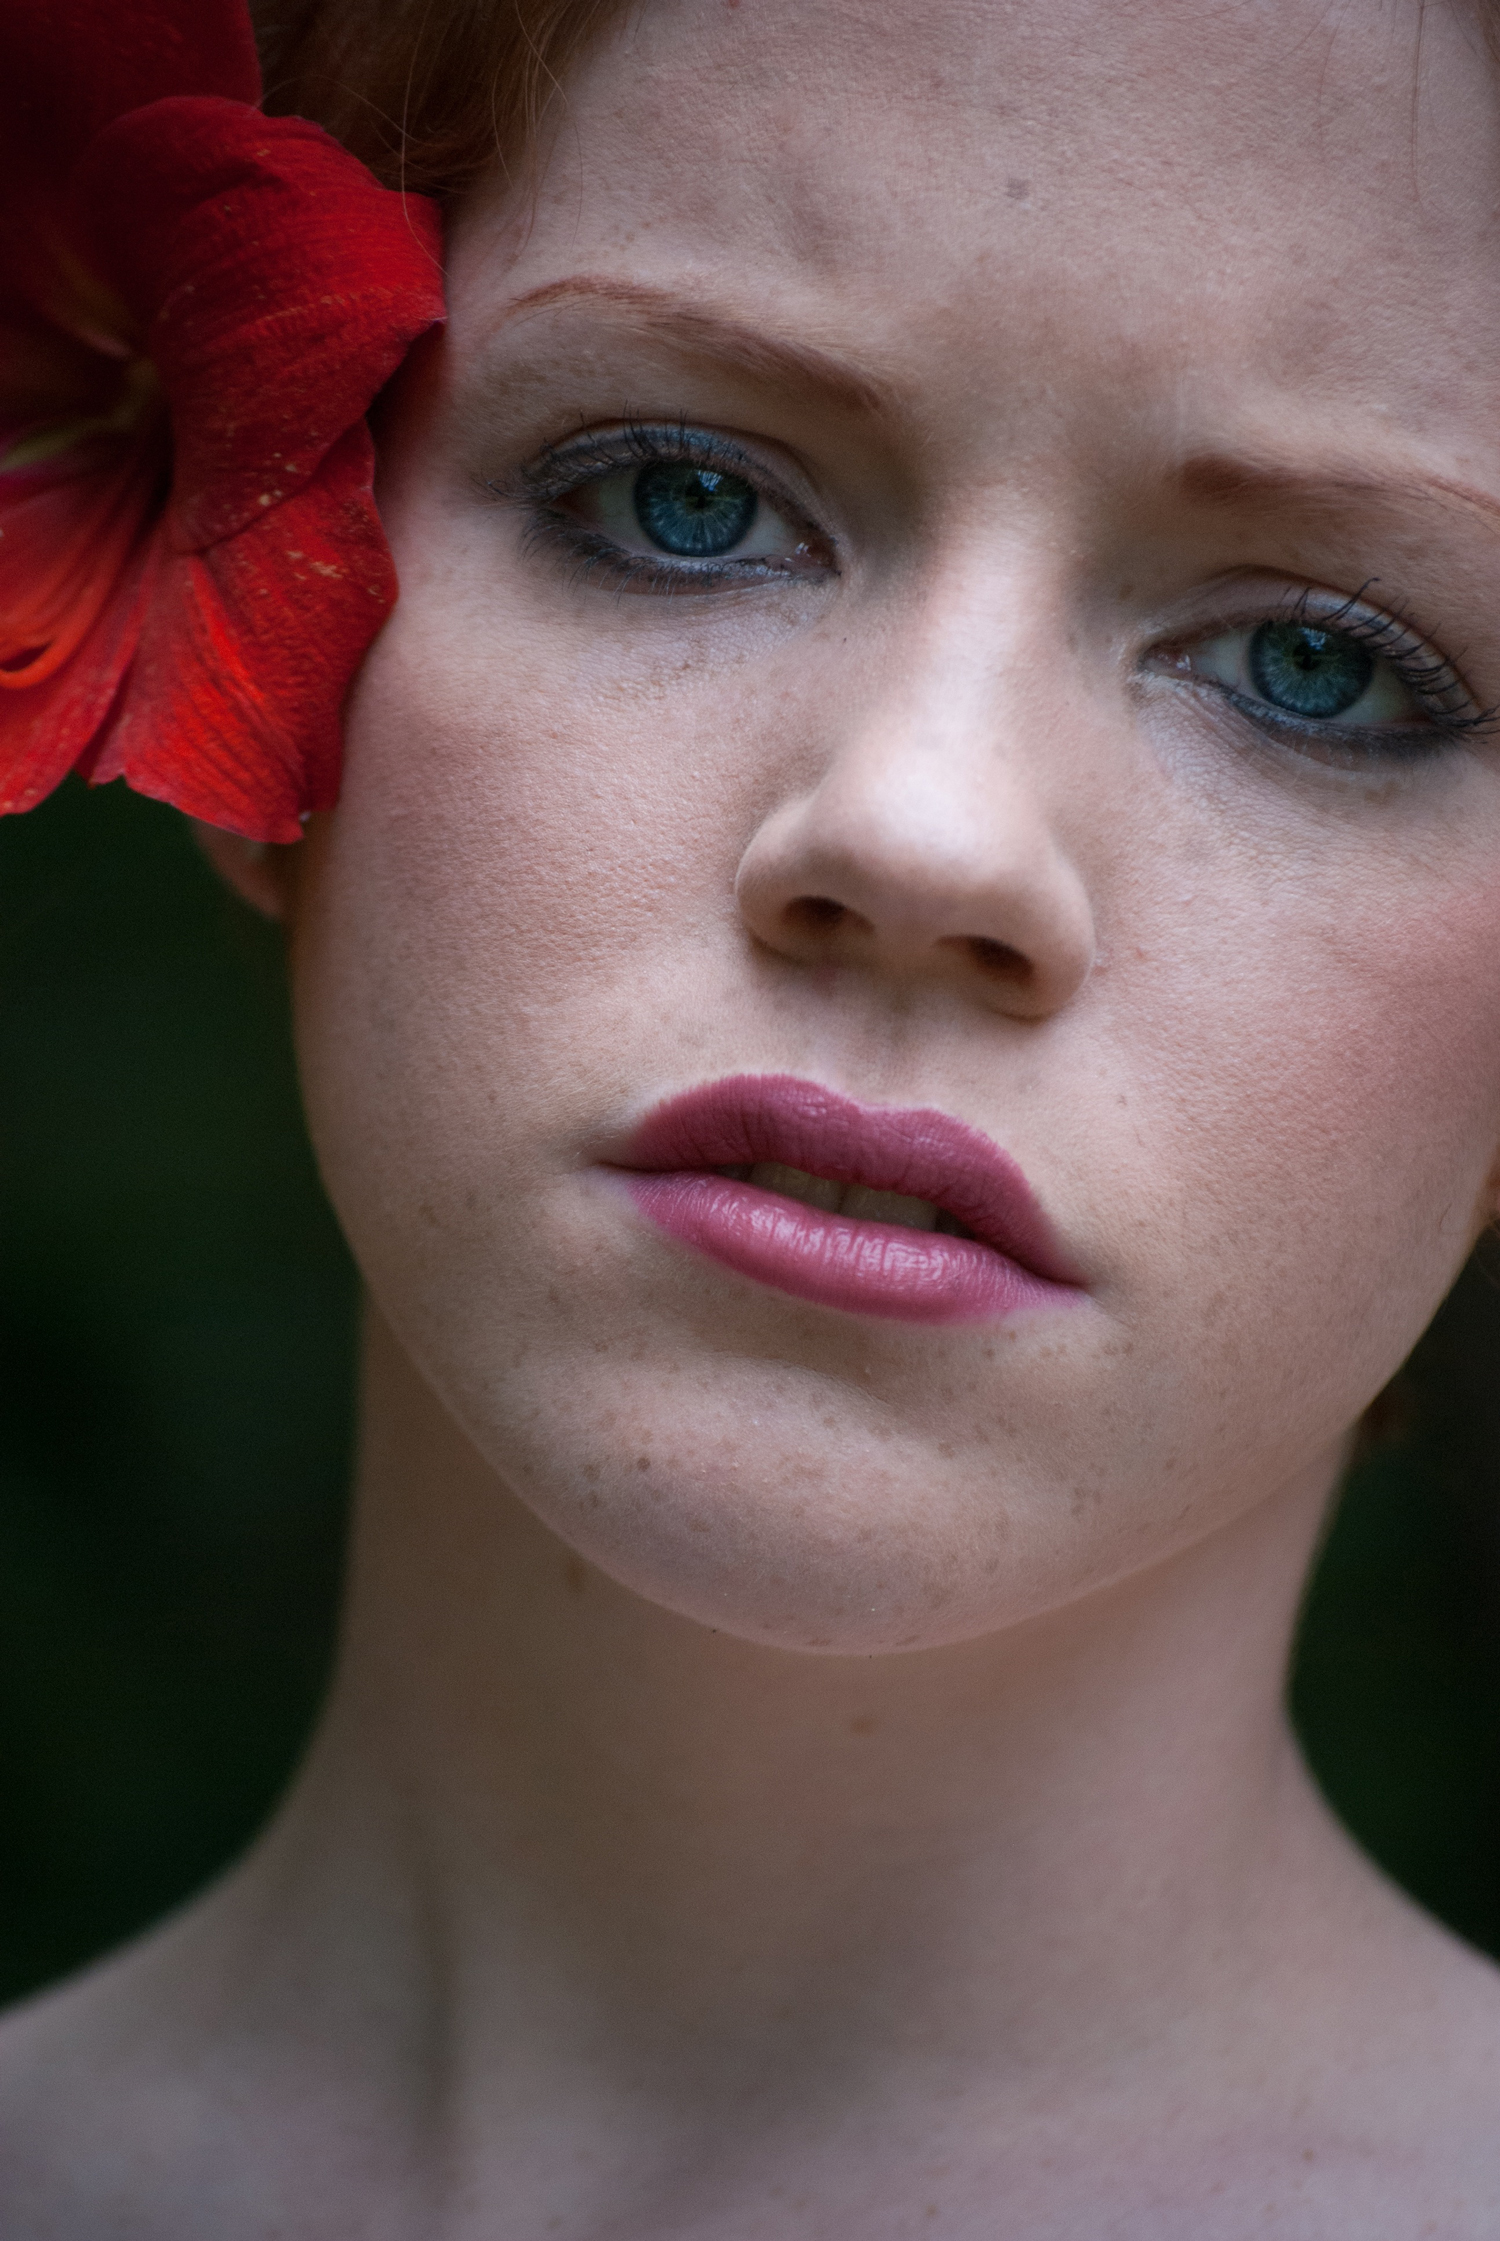 girl, Beauty, retouching, portrait, face, flower, photography, photoshop, photo editing, photo manipulation